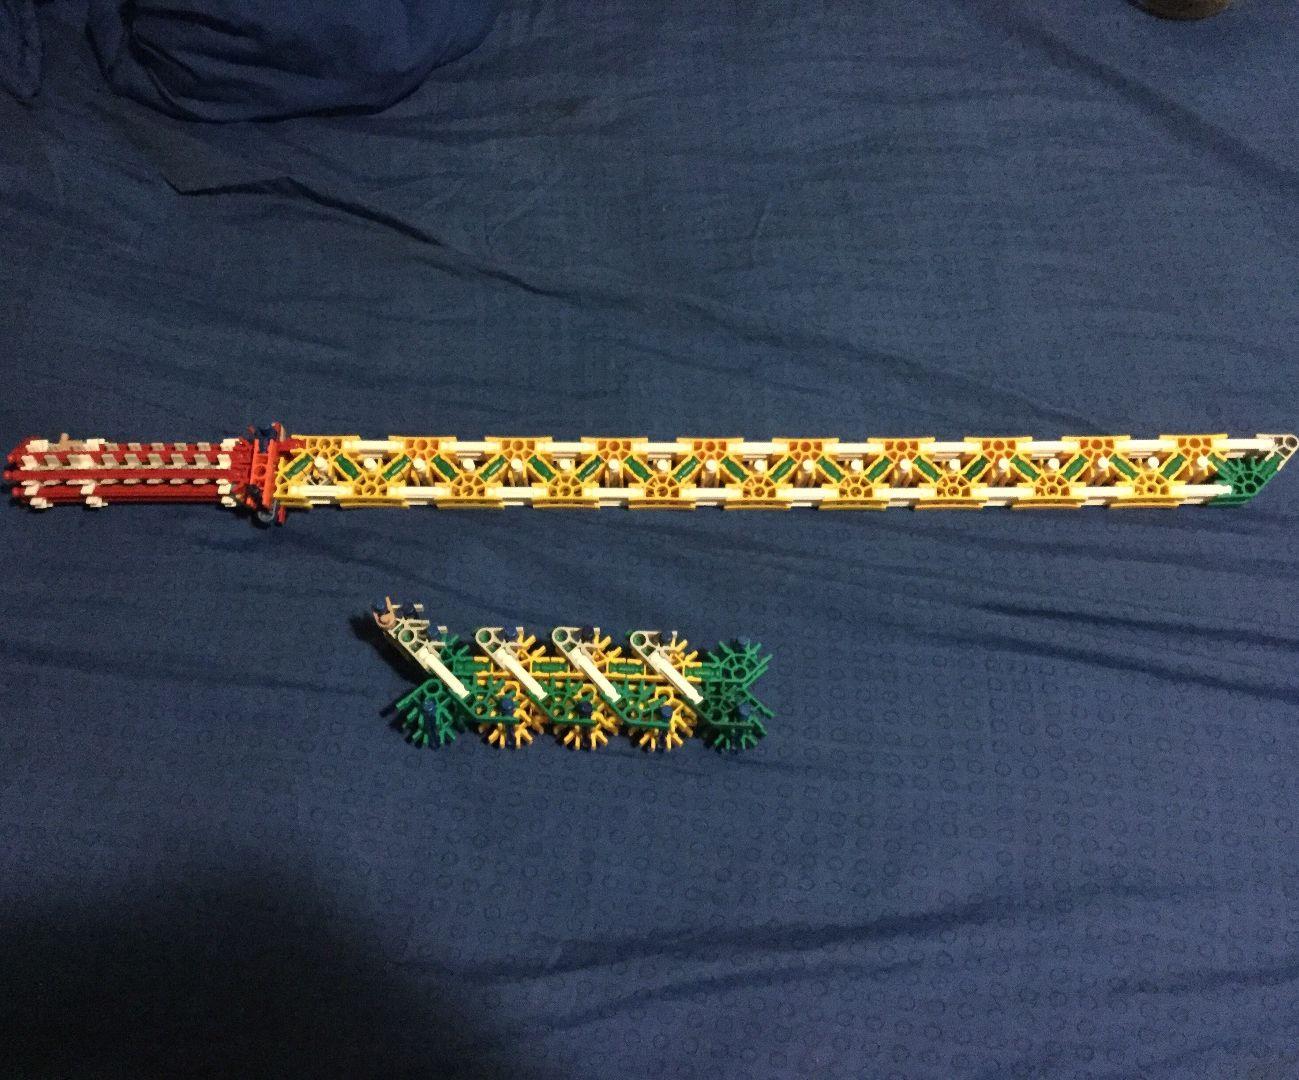 An Awsome Knex Sword, Very Sturdy and Reliable.